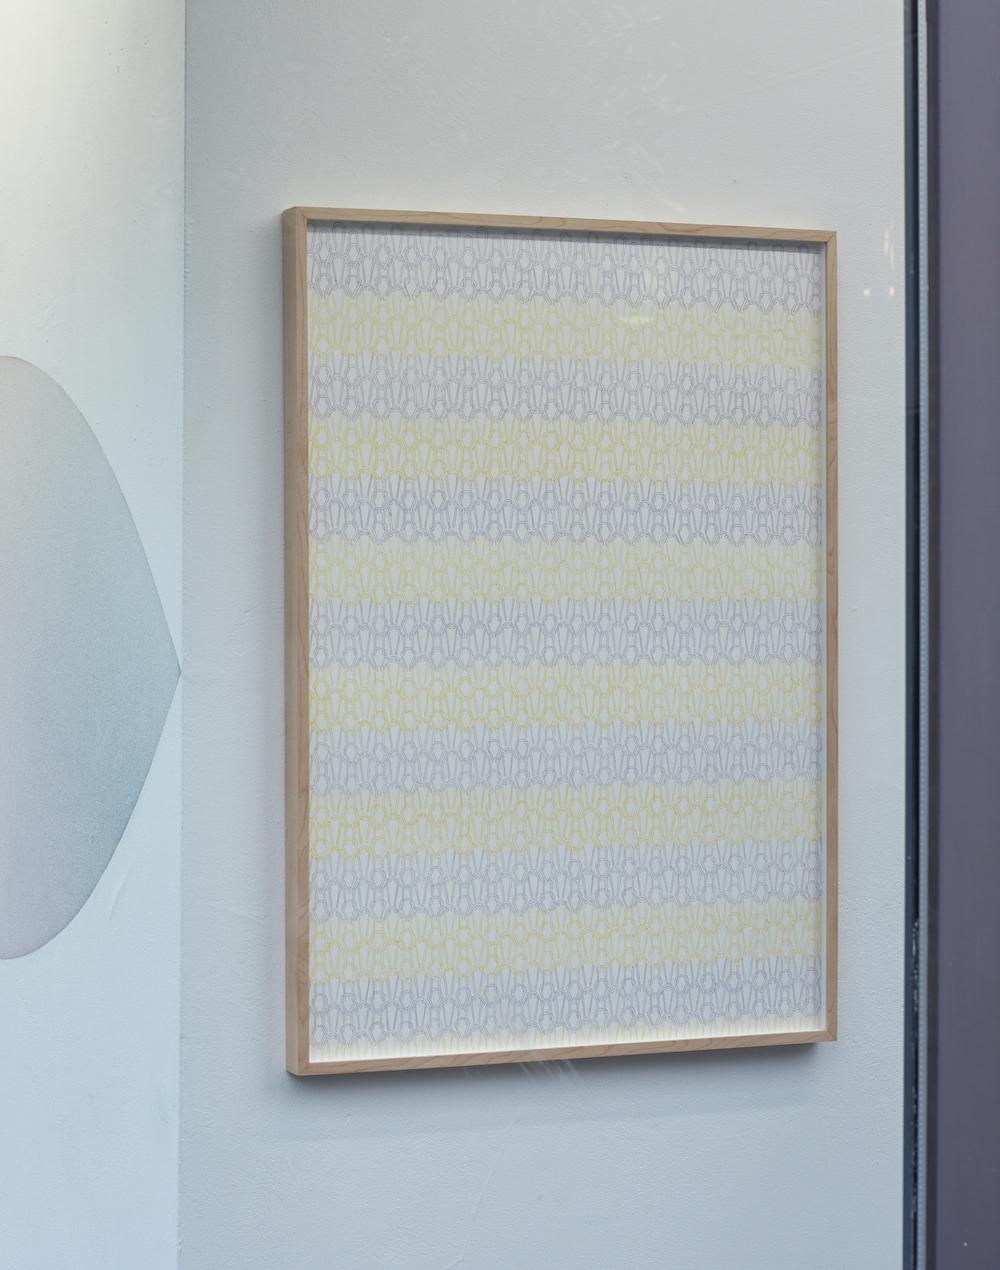 Kato Six, Striped Knitwear, 2018. Pencil on paper. 50 x 70 cm. Photographer Jonathon Bassett.